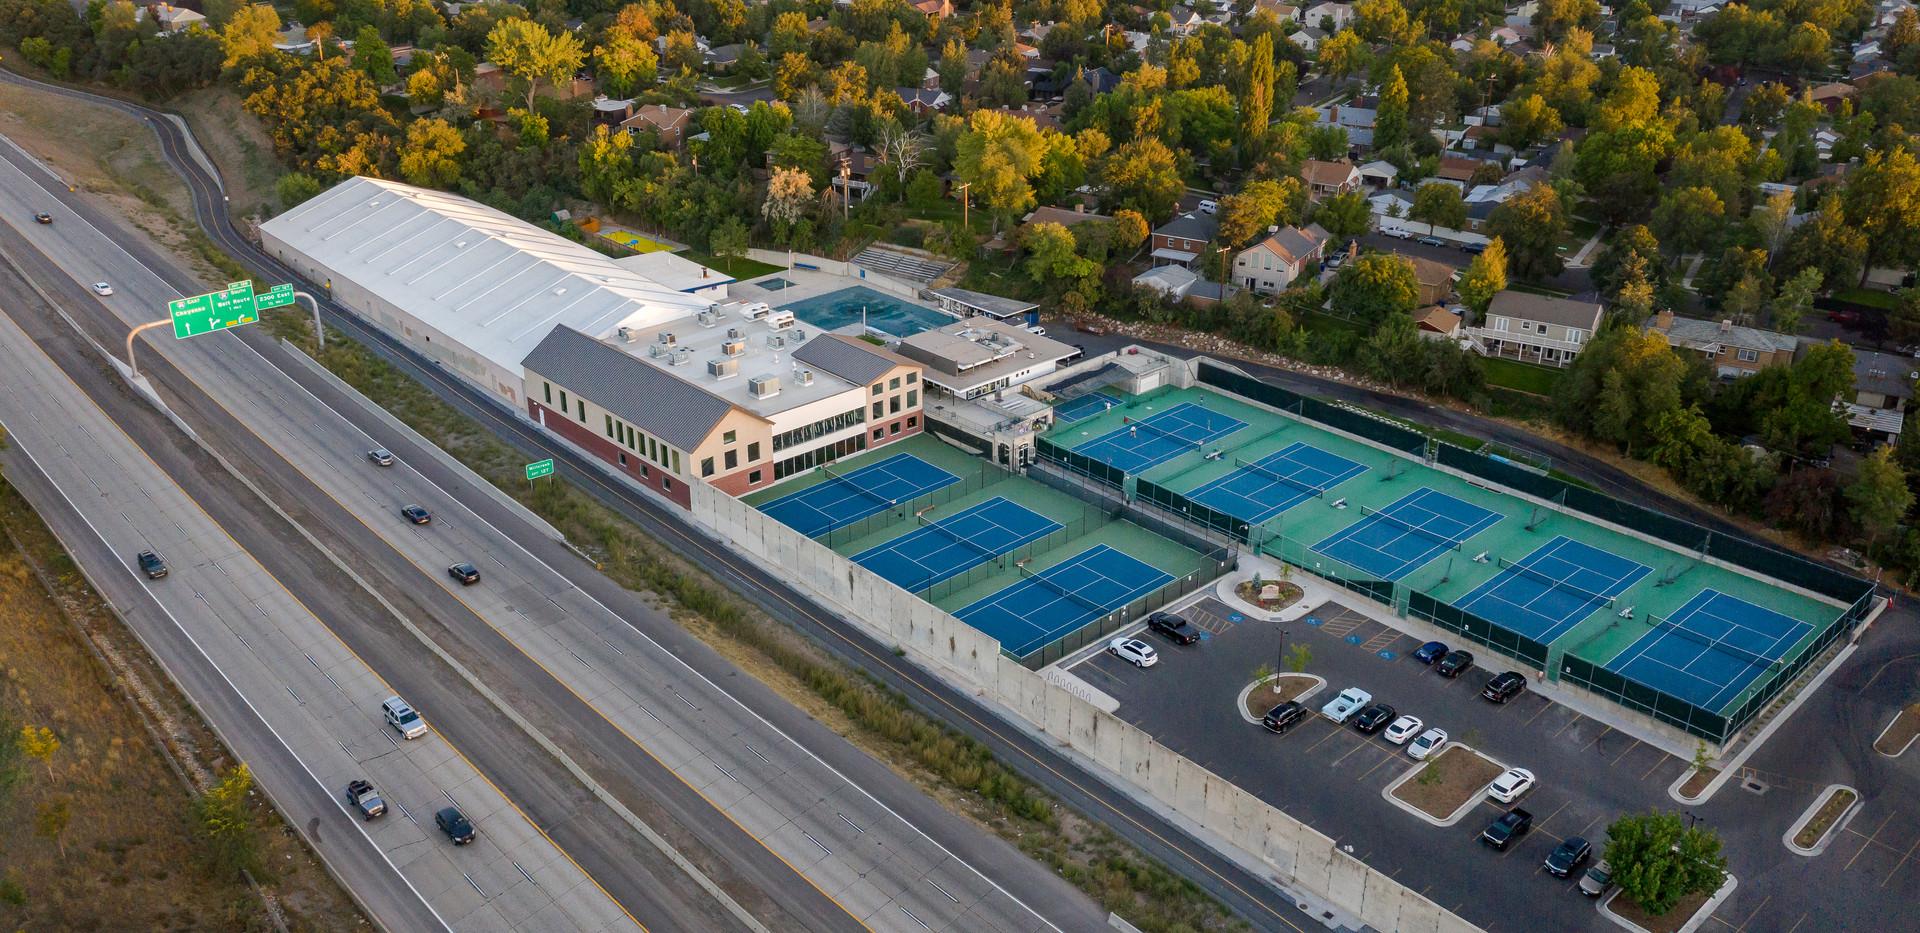 SL Tennis Club